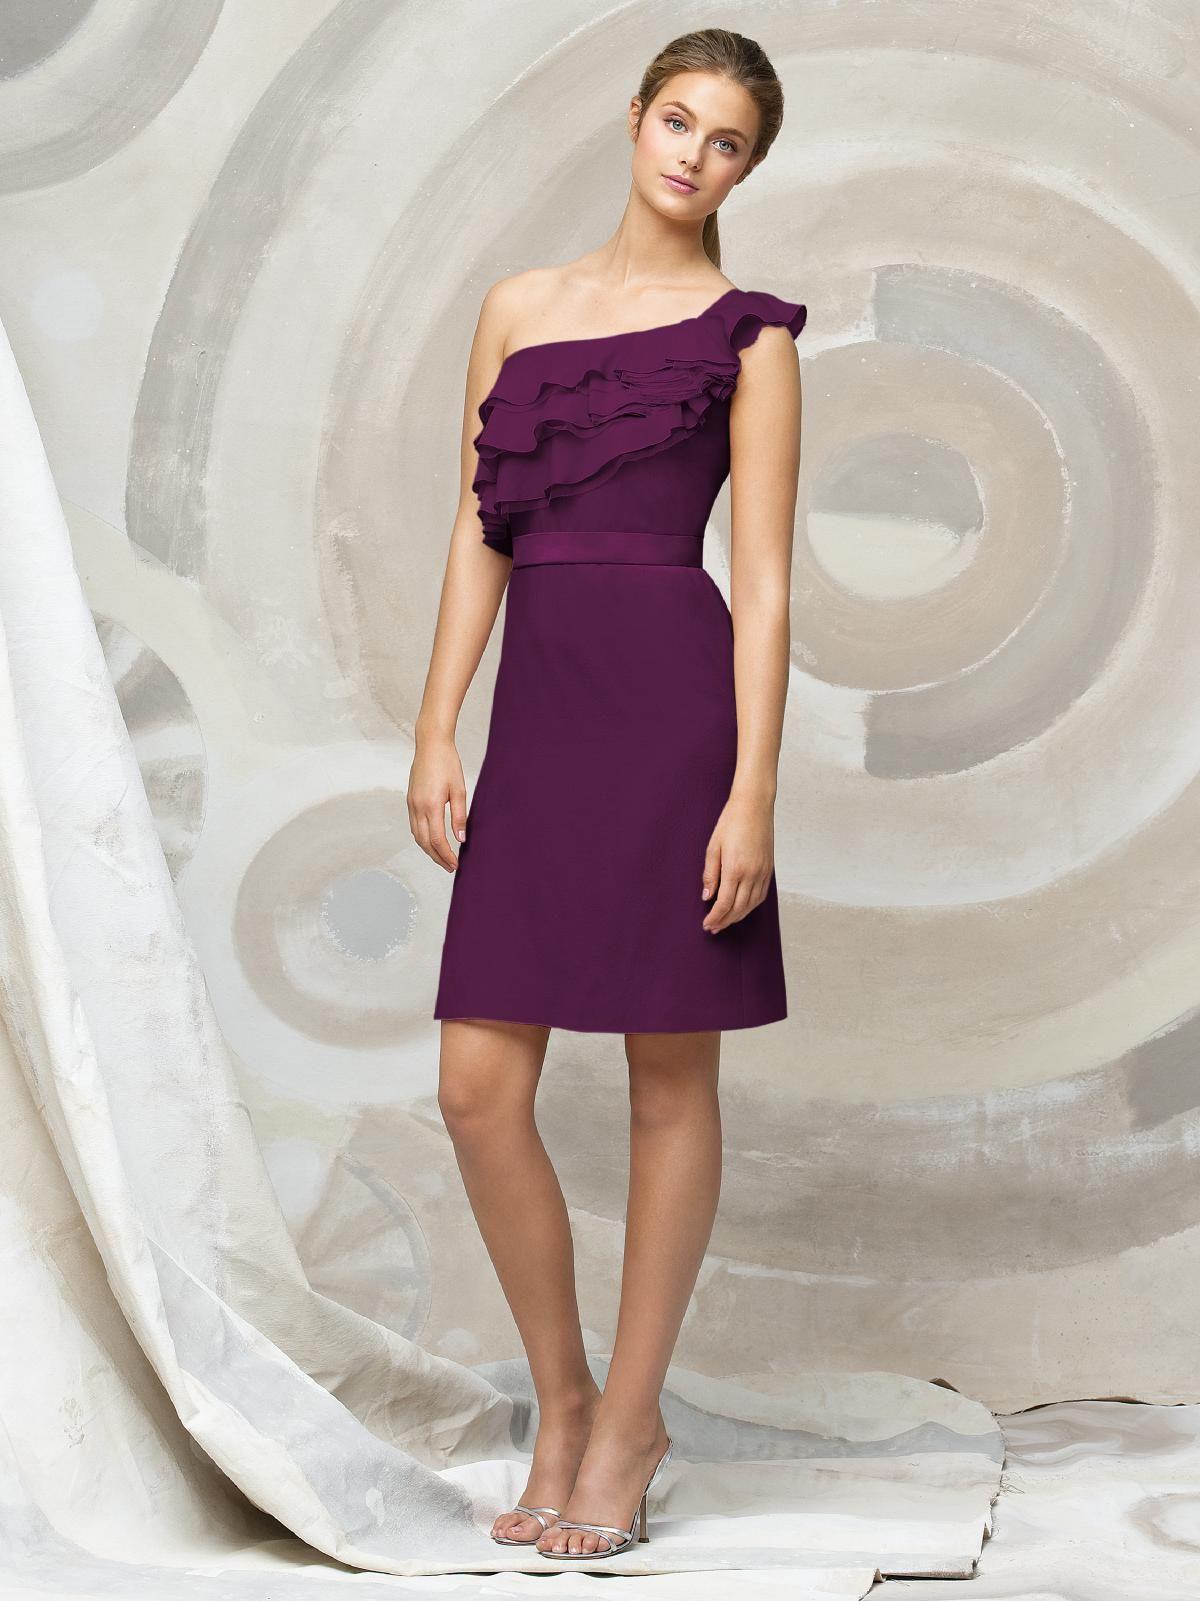 Lela Rose LR123 in wild berry | Bridesmaid Dresses | Pinterest